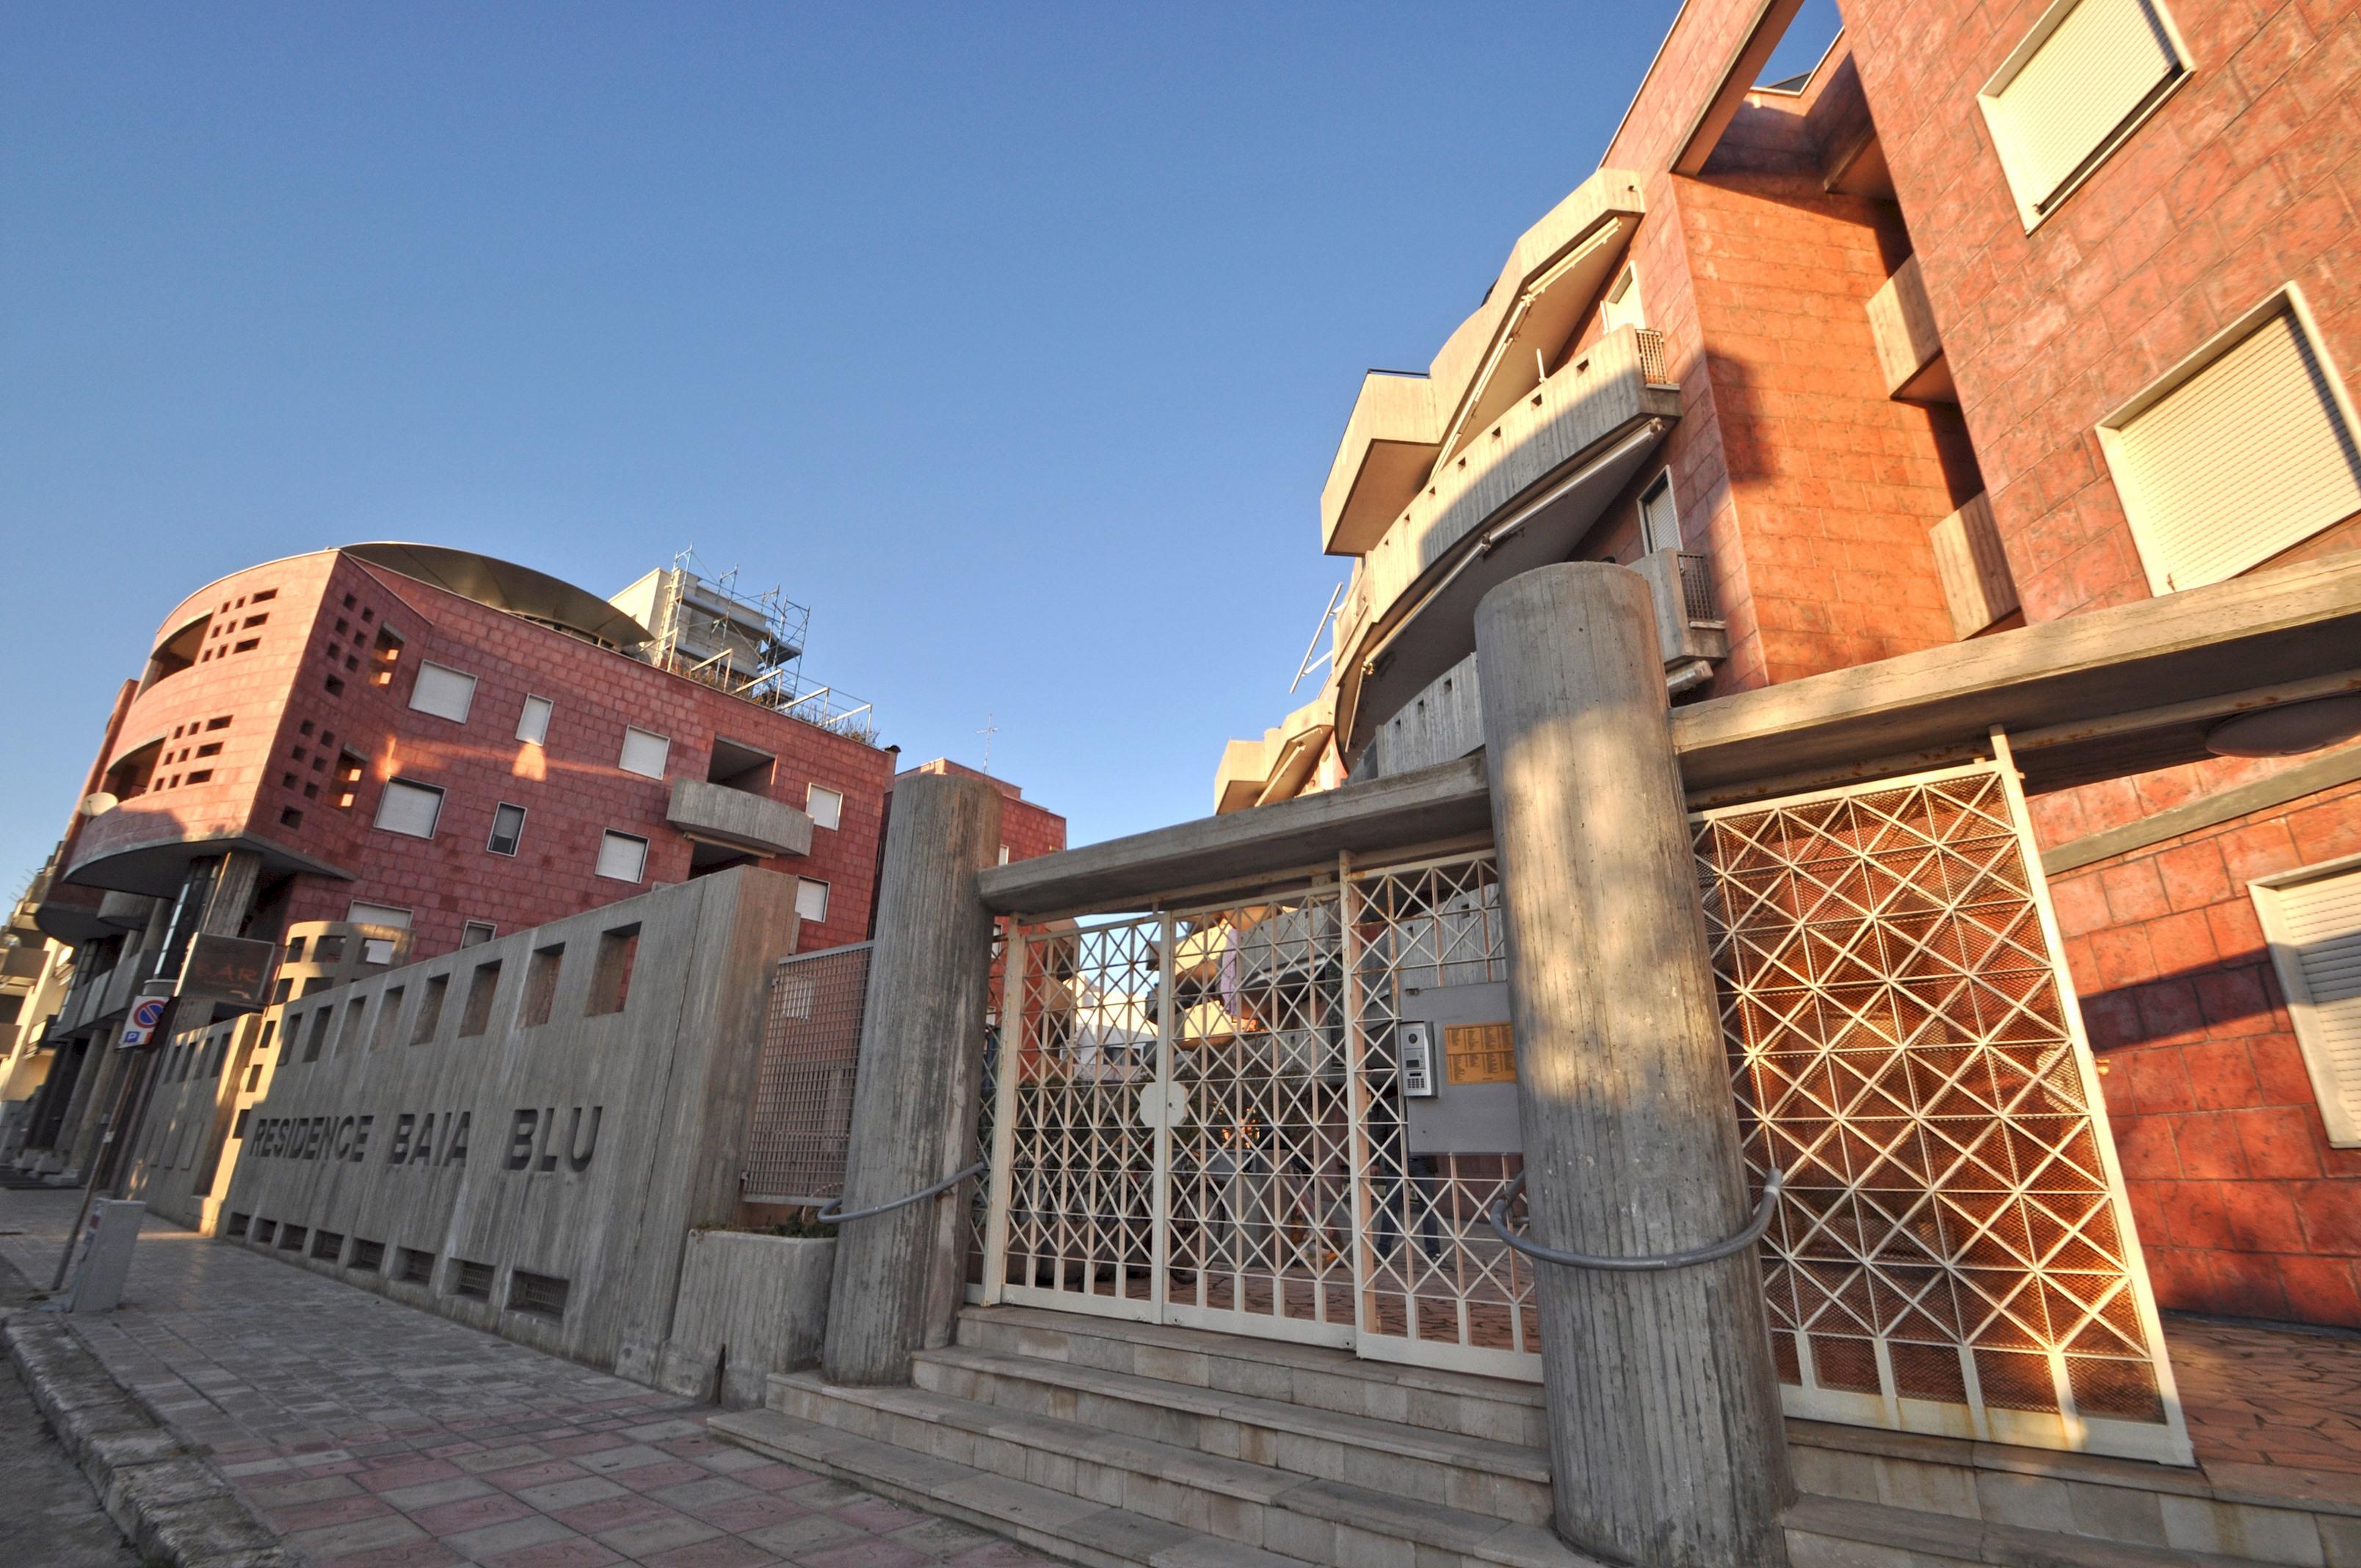 Ferienwohnung Appartamento vista mare a Gallipoli 4/6 posti - Baia Blu Side (2574458), Gallipoli, Lecce, Apulien, Italien, Bild 17